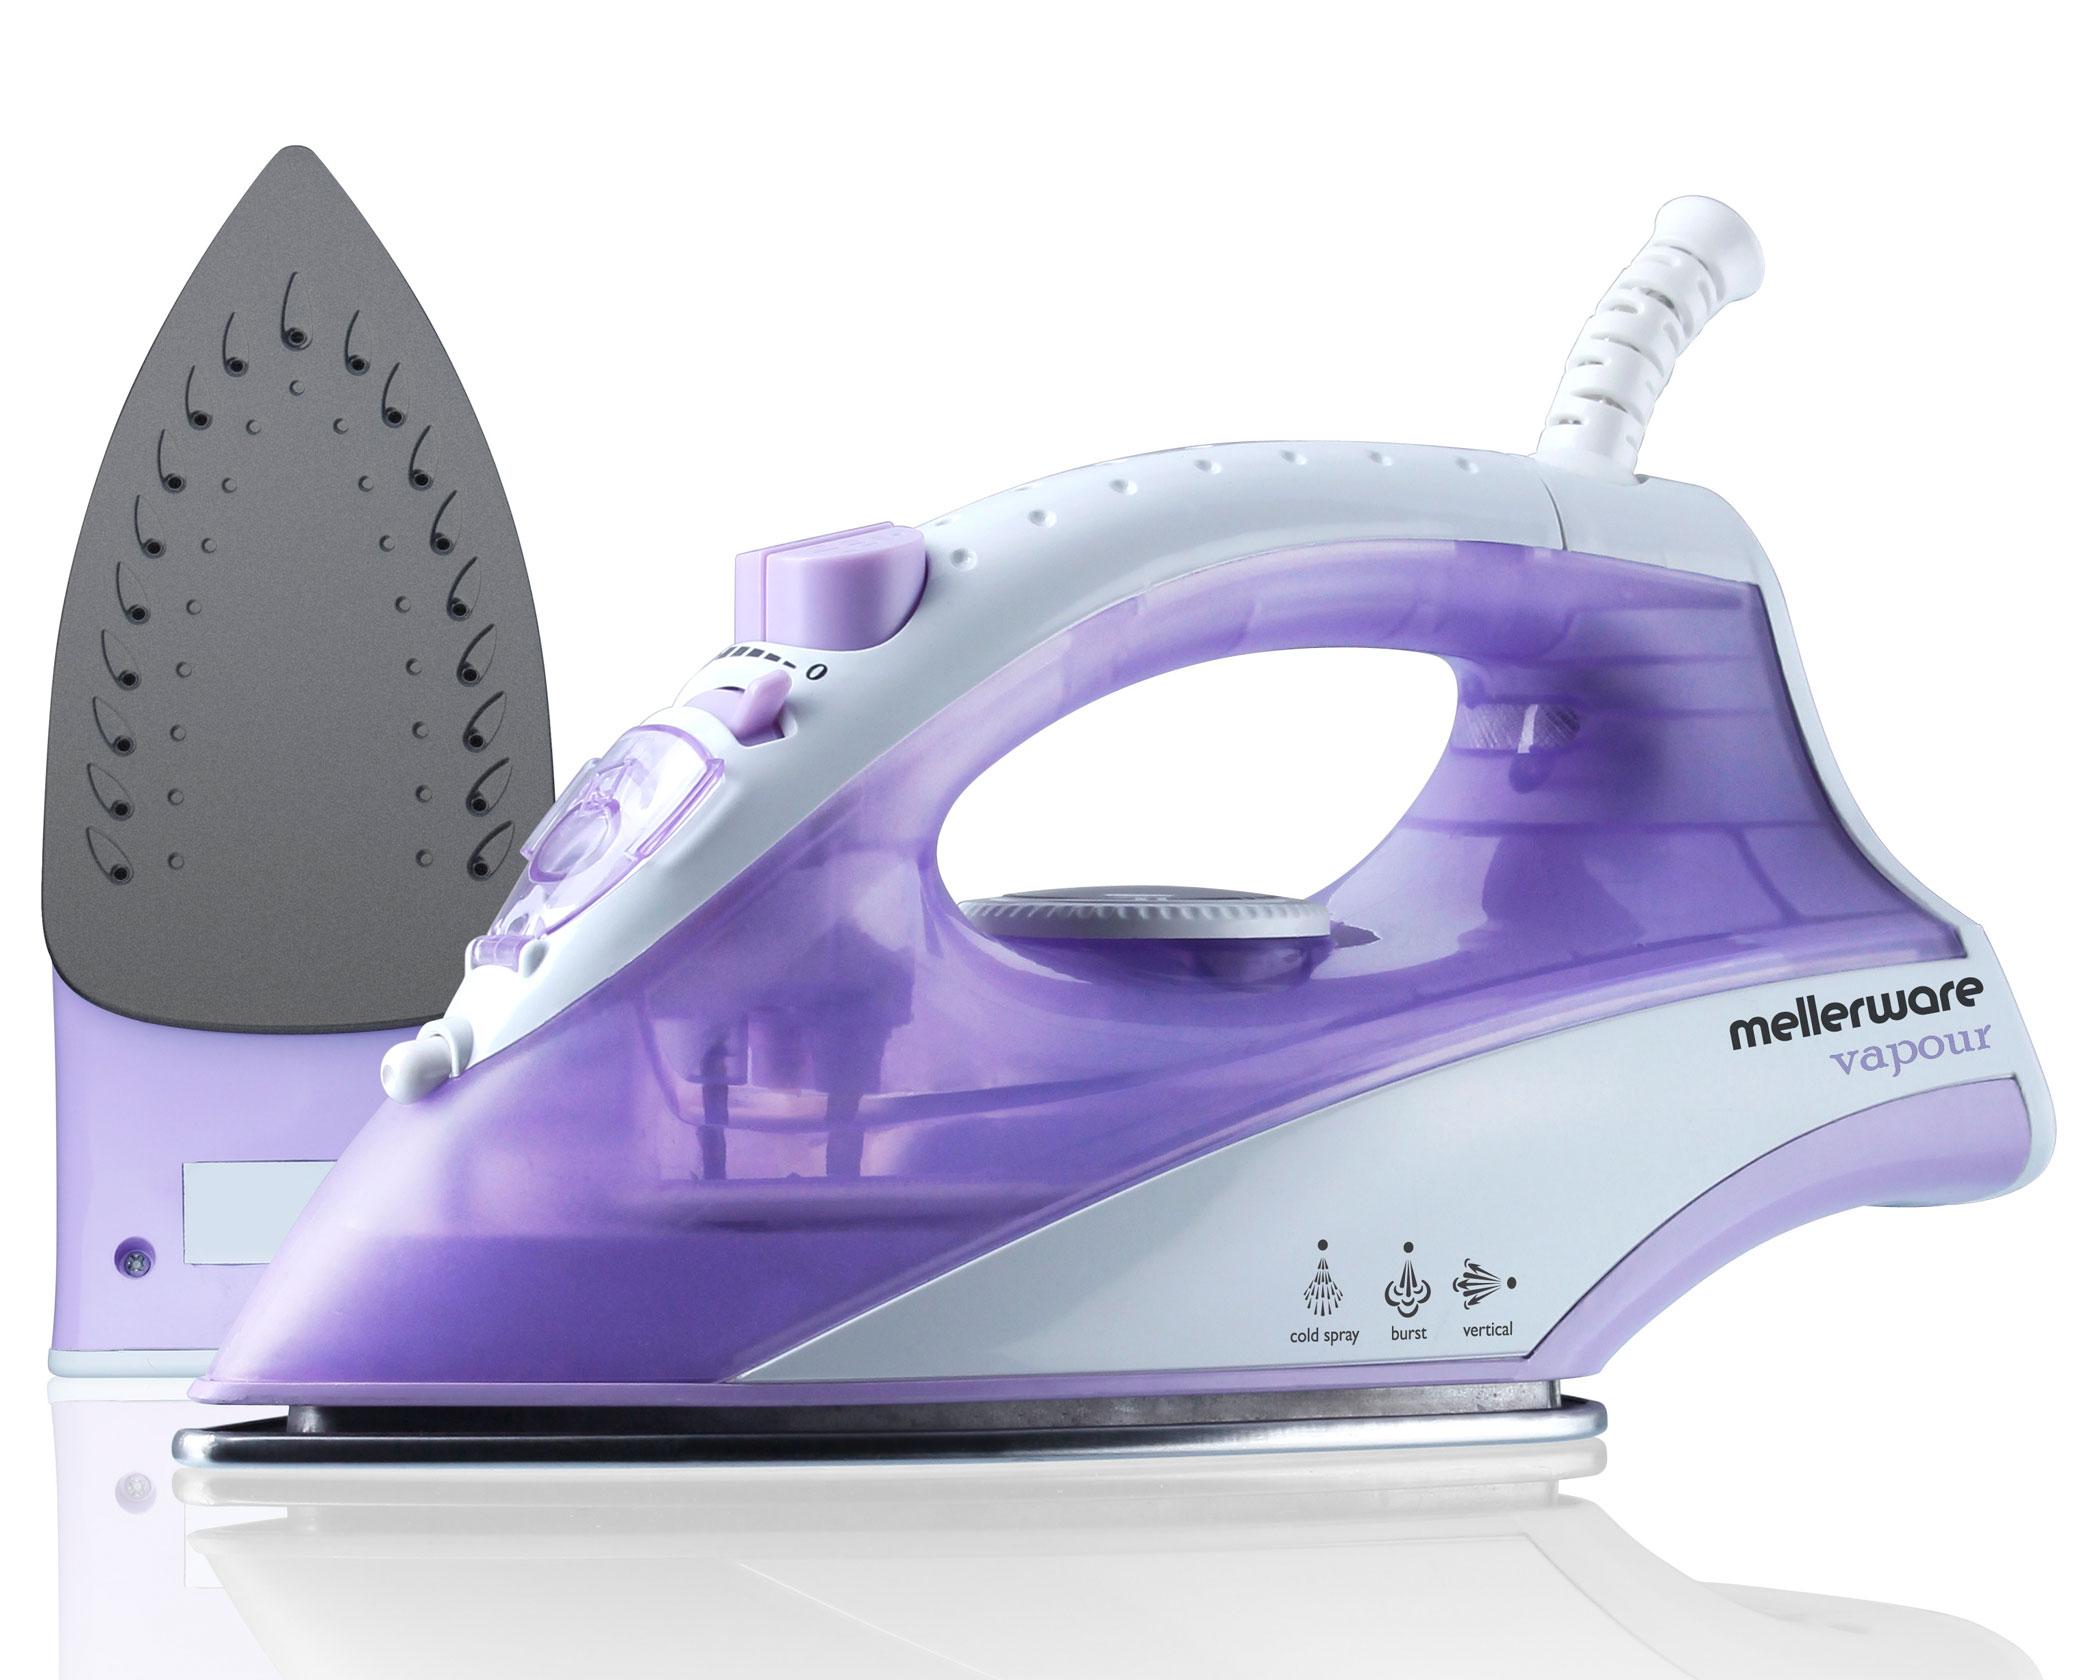 vapour-steam-iron-23140-large-4